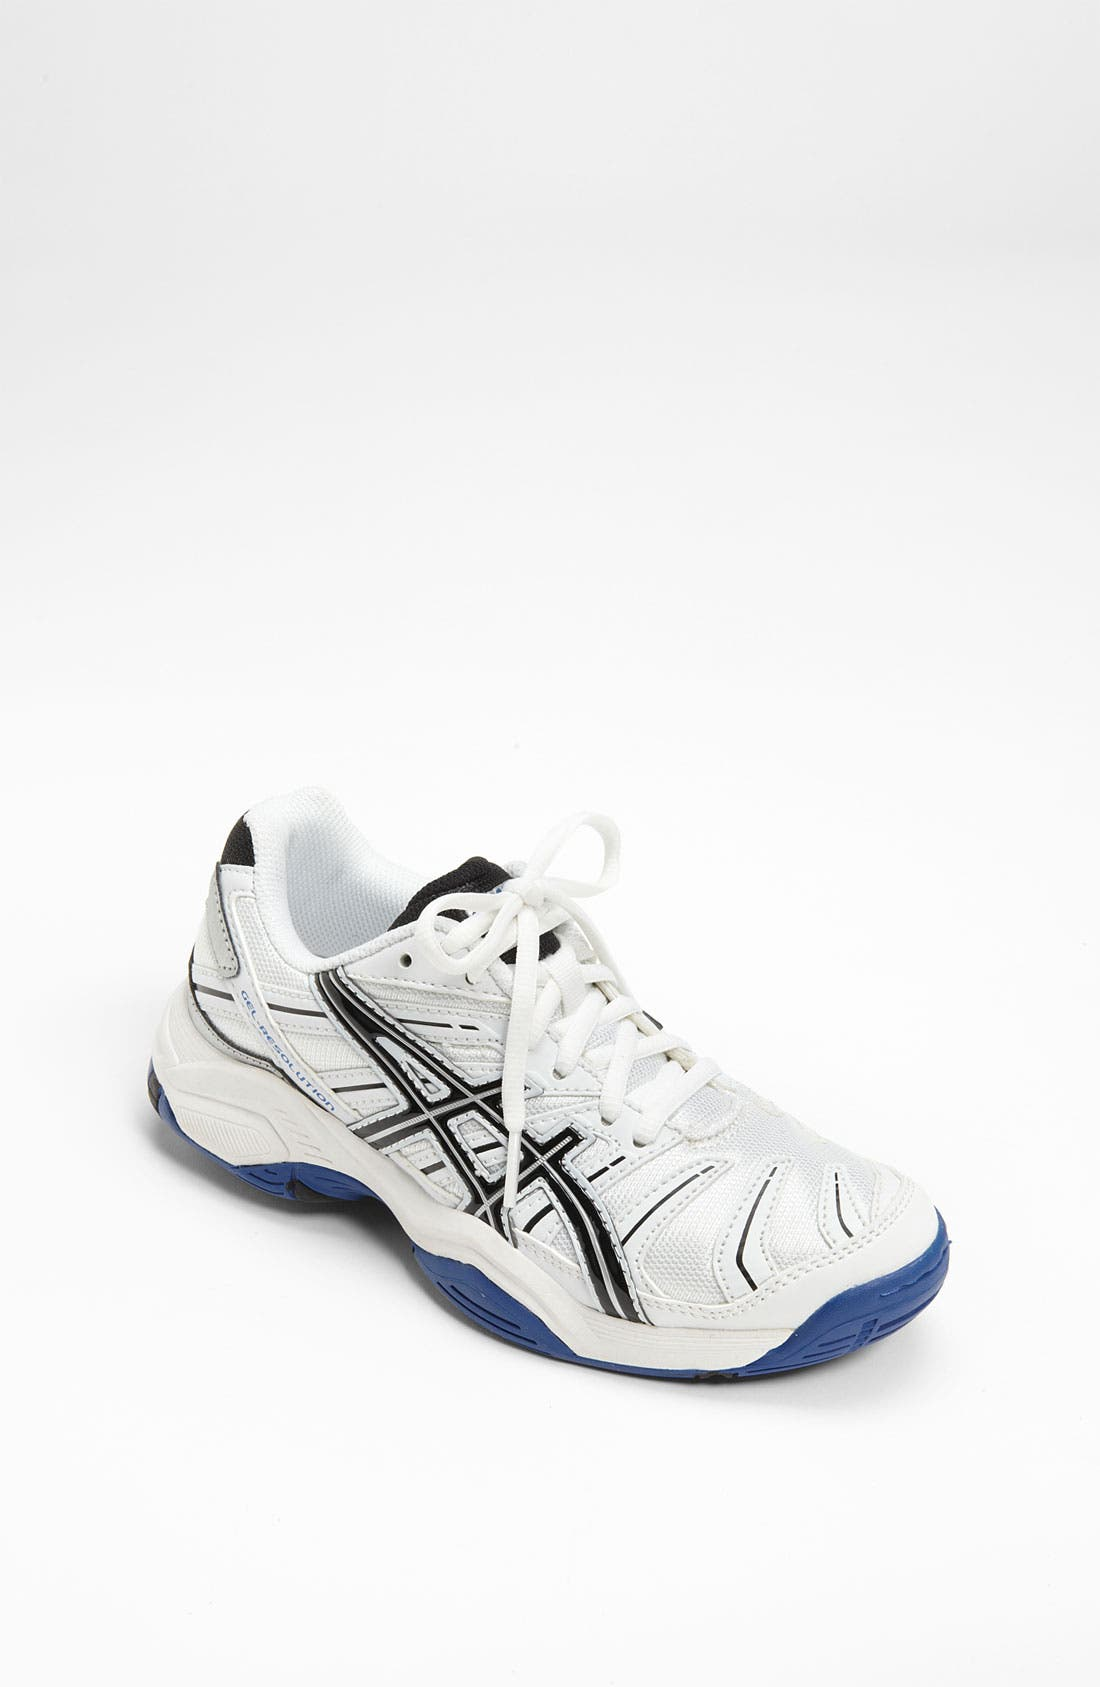 Alternate Image 1 Selected - ASICS® 'GEL-Resolution' Tennis Shoe (Little Kid & Big Kid)